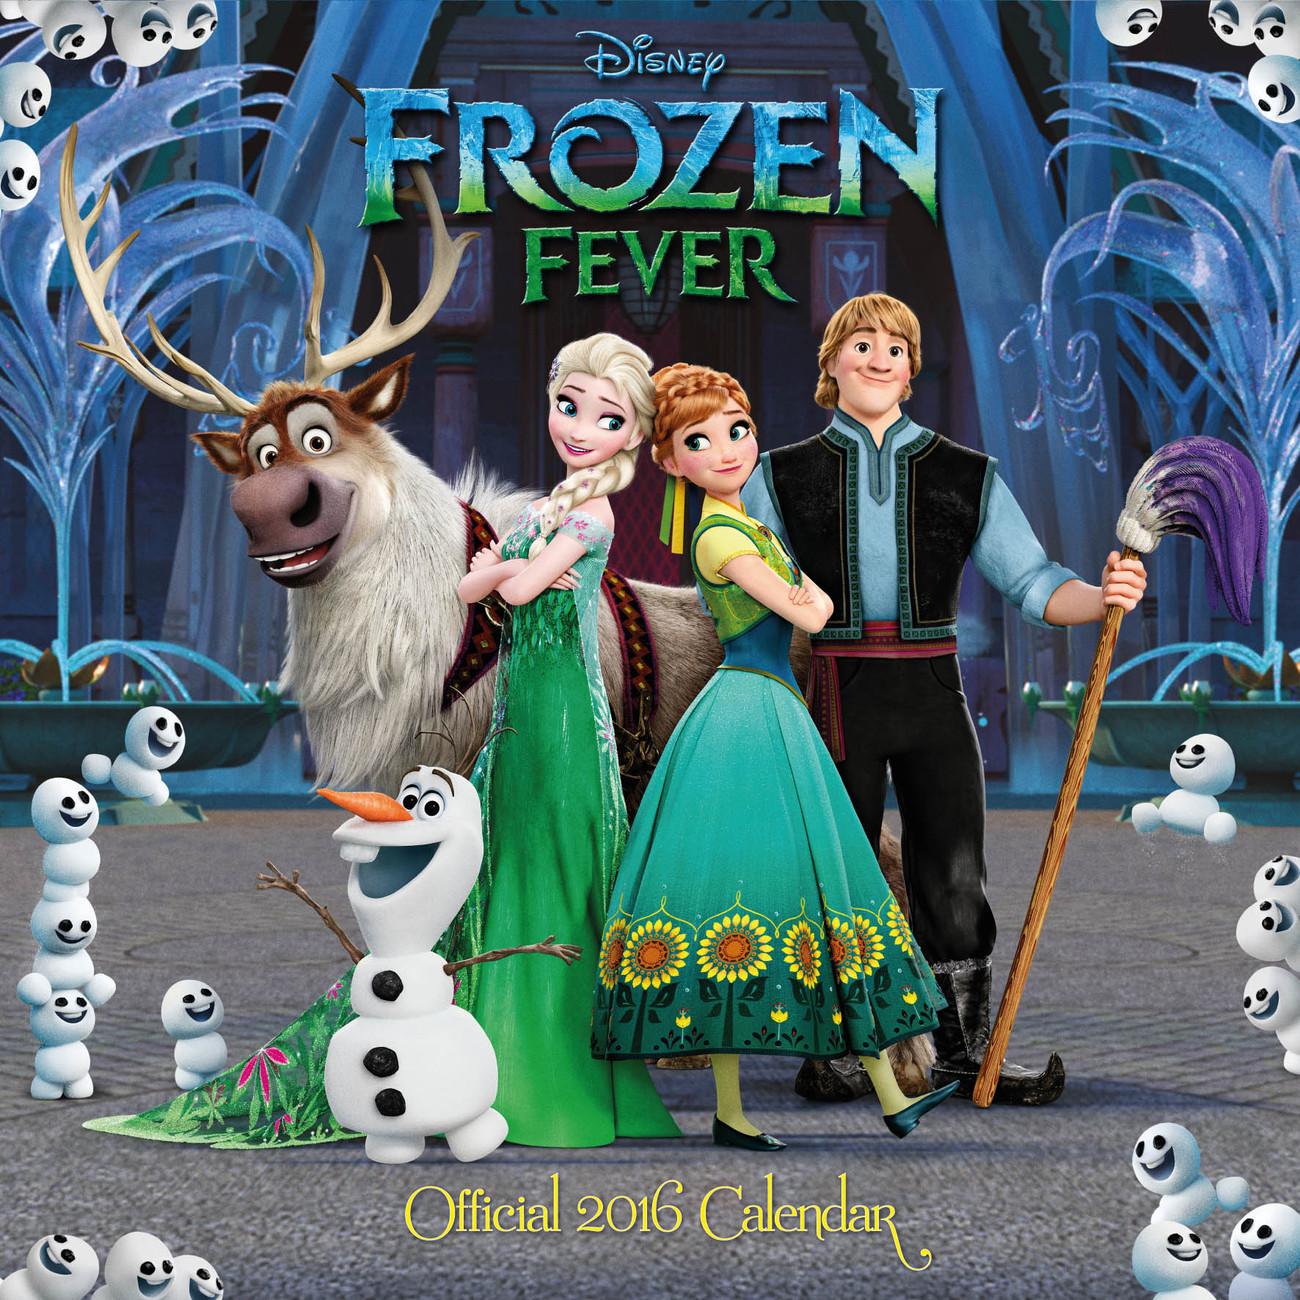 Image Gallery Frozen 3 Movie 2017